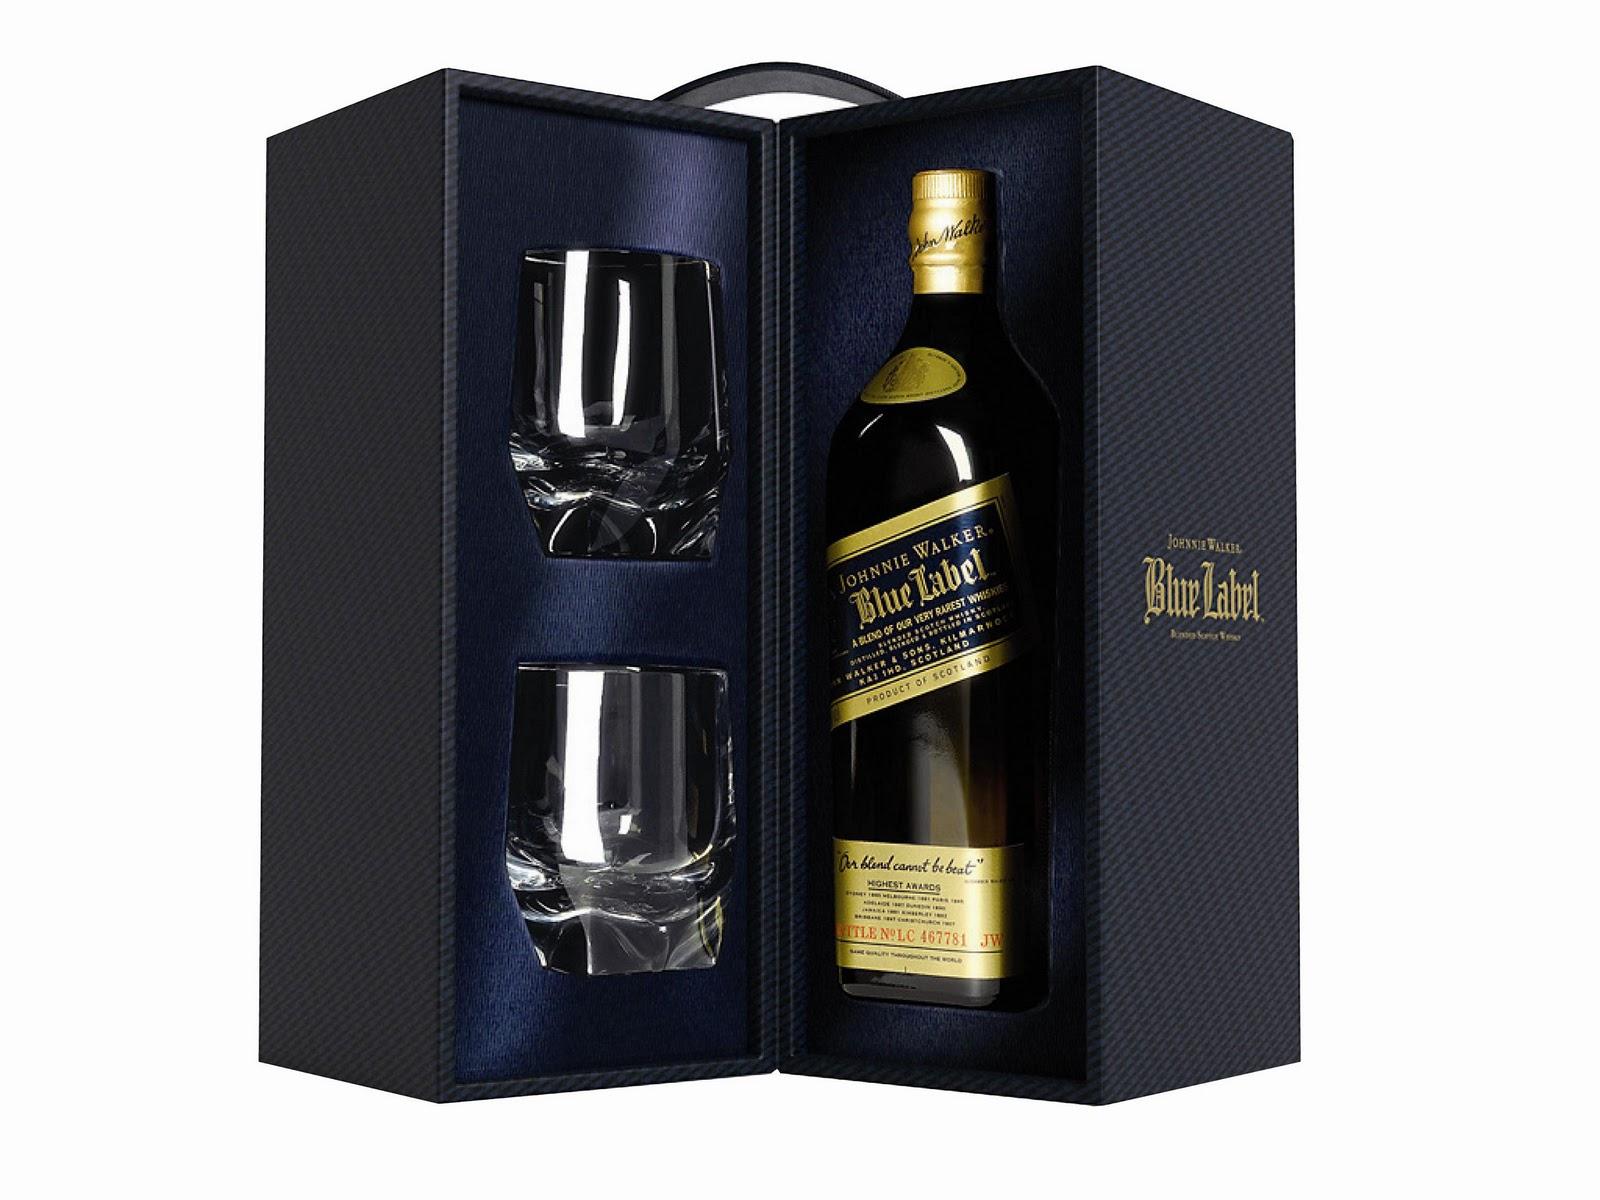 johnnie walker blue label el whisky súper deluxe de la línea johnnie